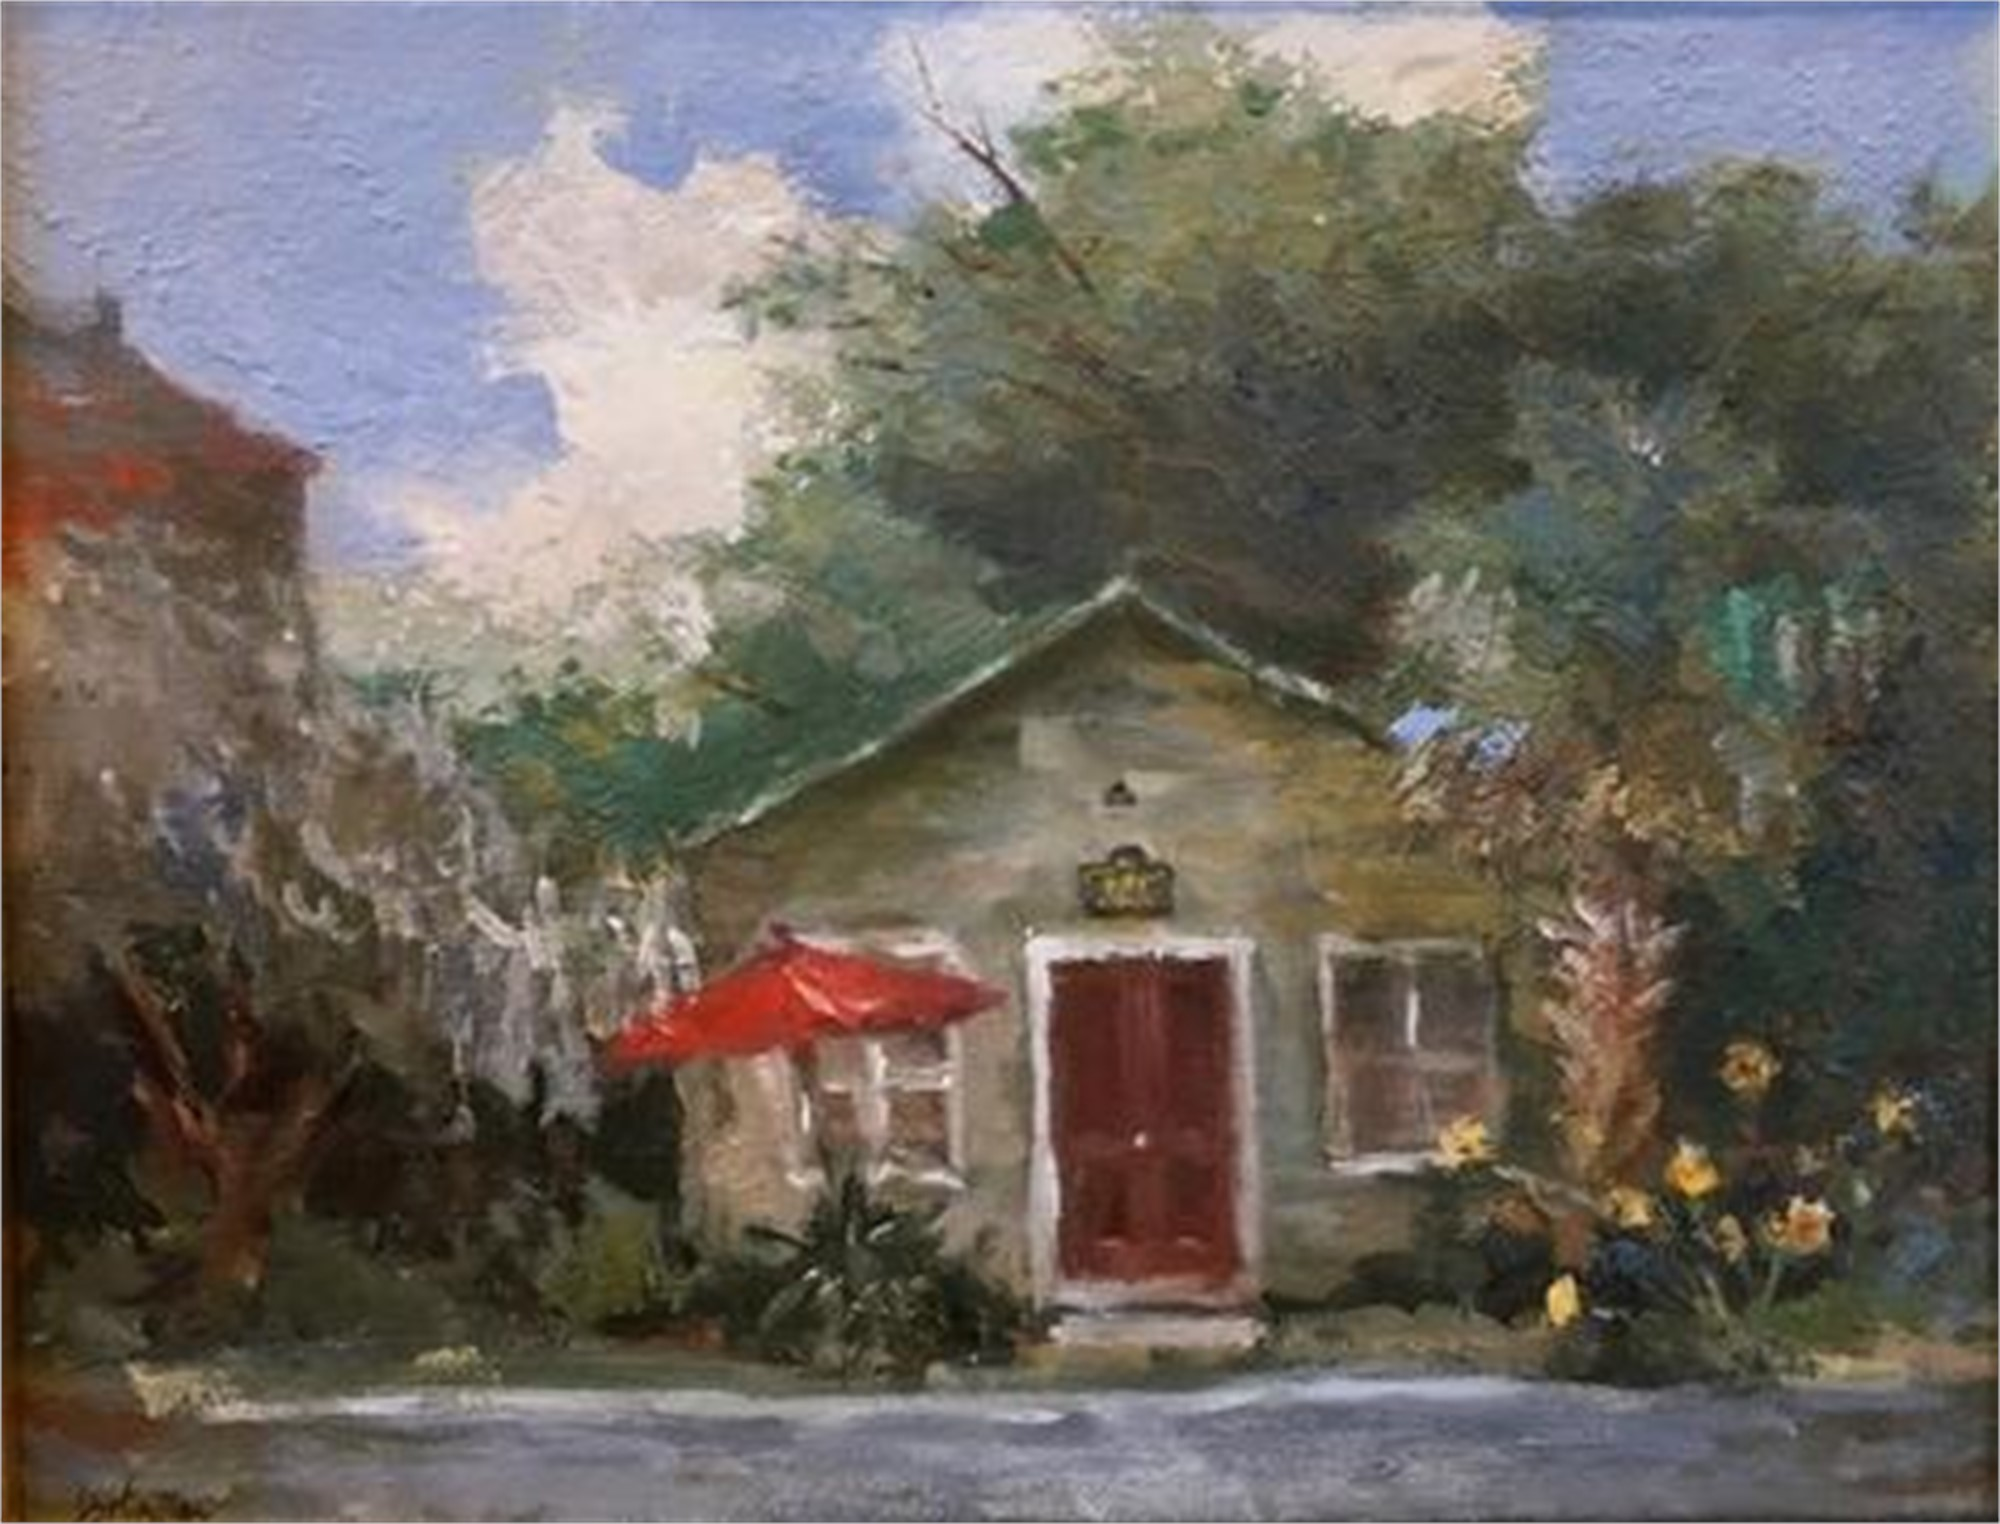 Mickeys Studio by Jim Darlington